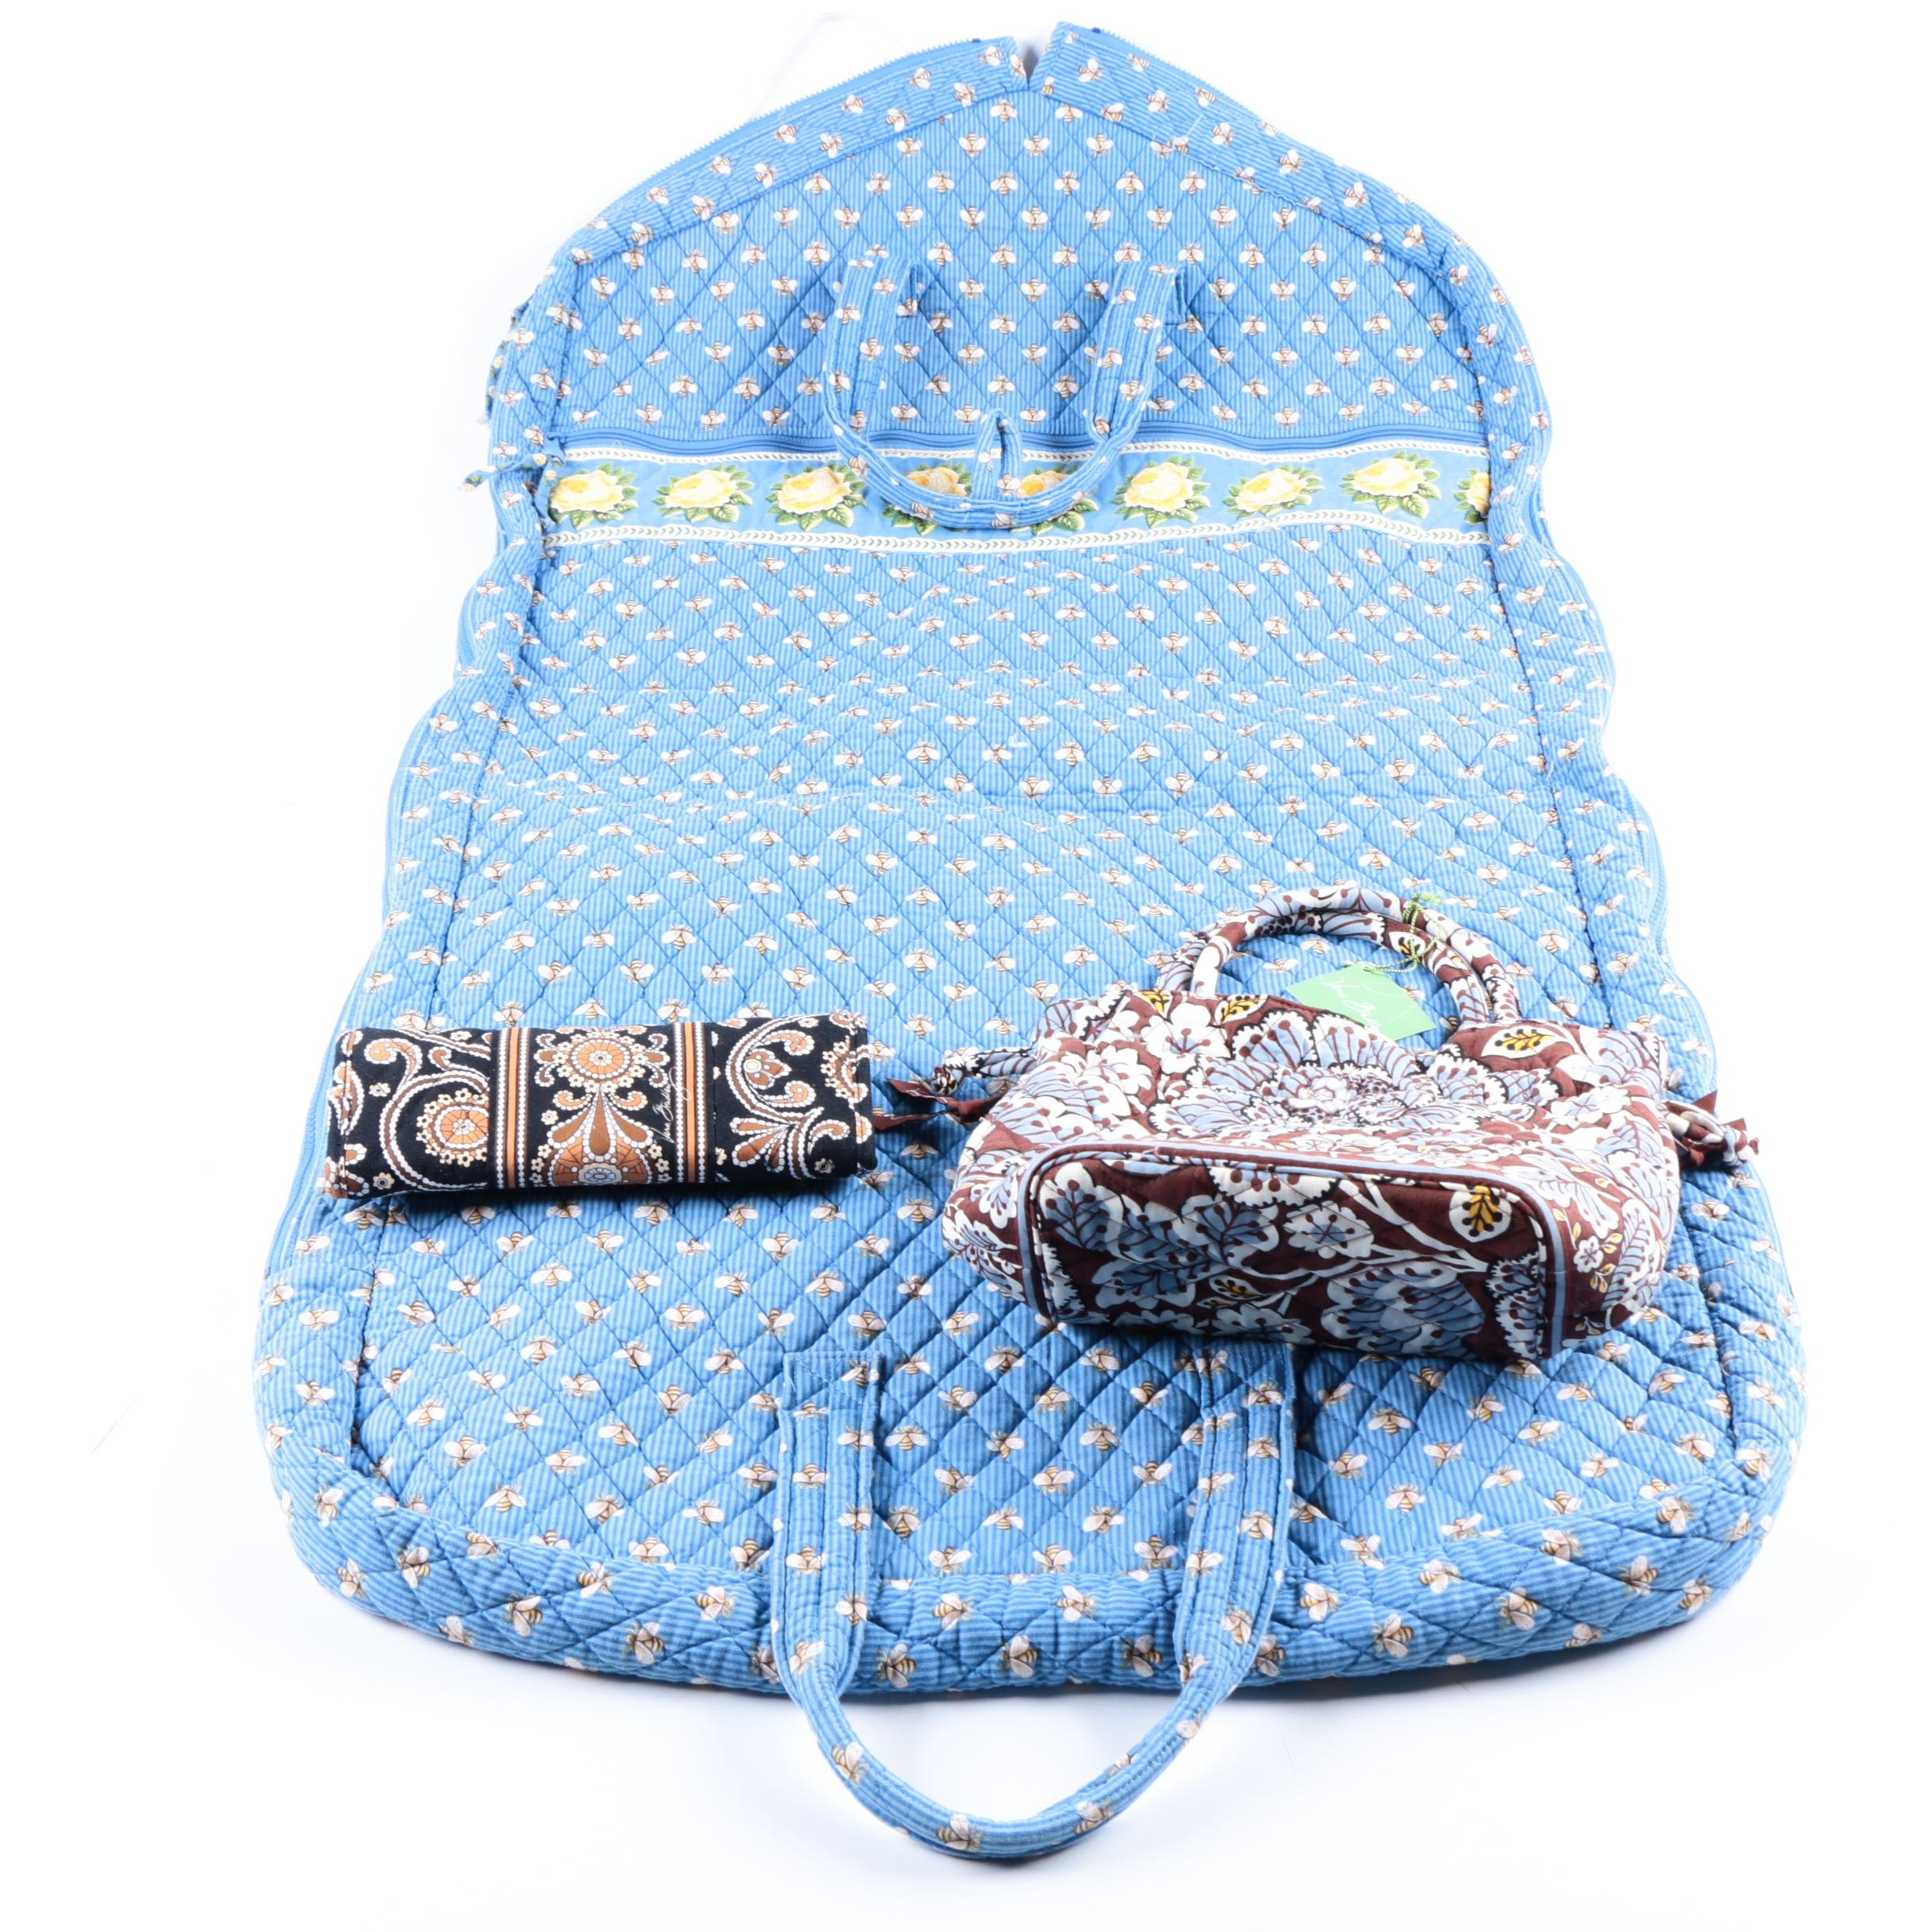 Vera Bradley Garment Bag, Tote and Wallet